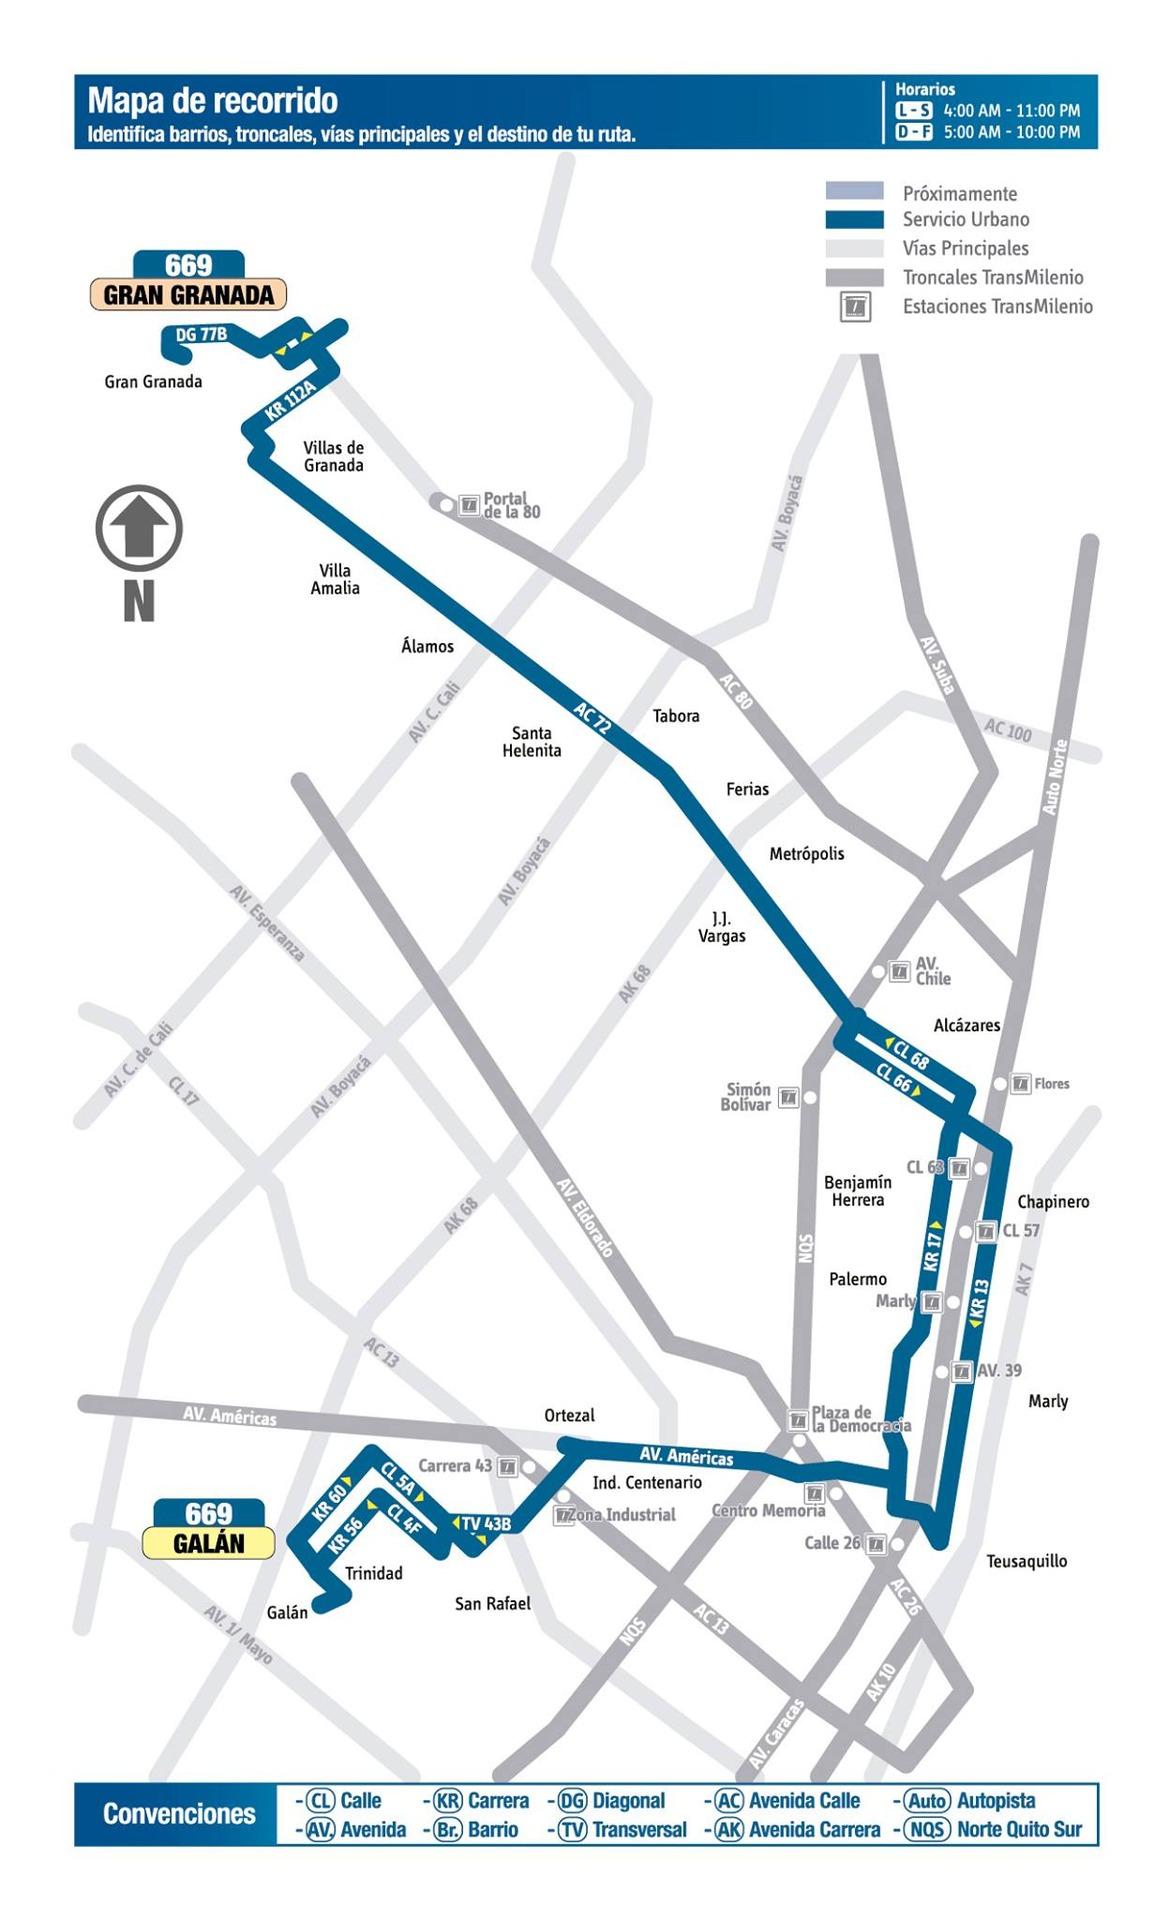 Ruta SITP: 669 Galán ↔ Gran Granada [Urbana] 6